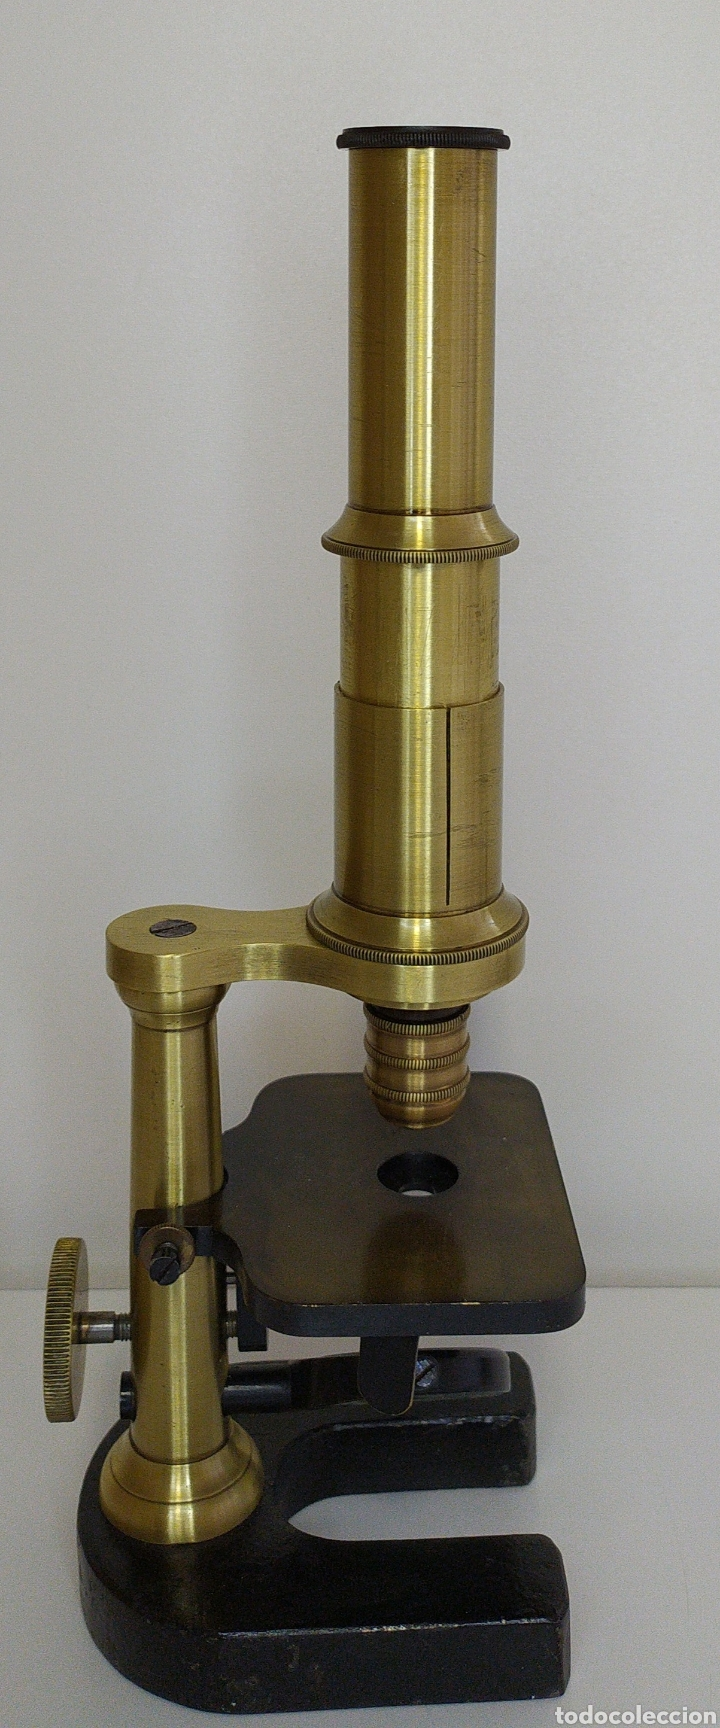 Antigüedades: Antiguo microscopio circa 1880. Tipo Schiek - Foto 6 - 253829690